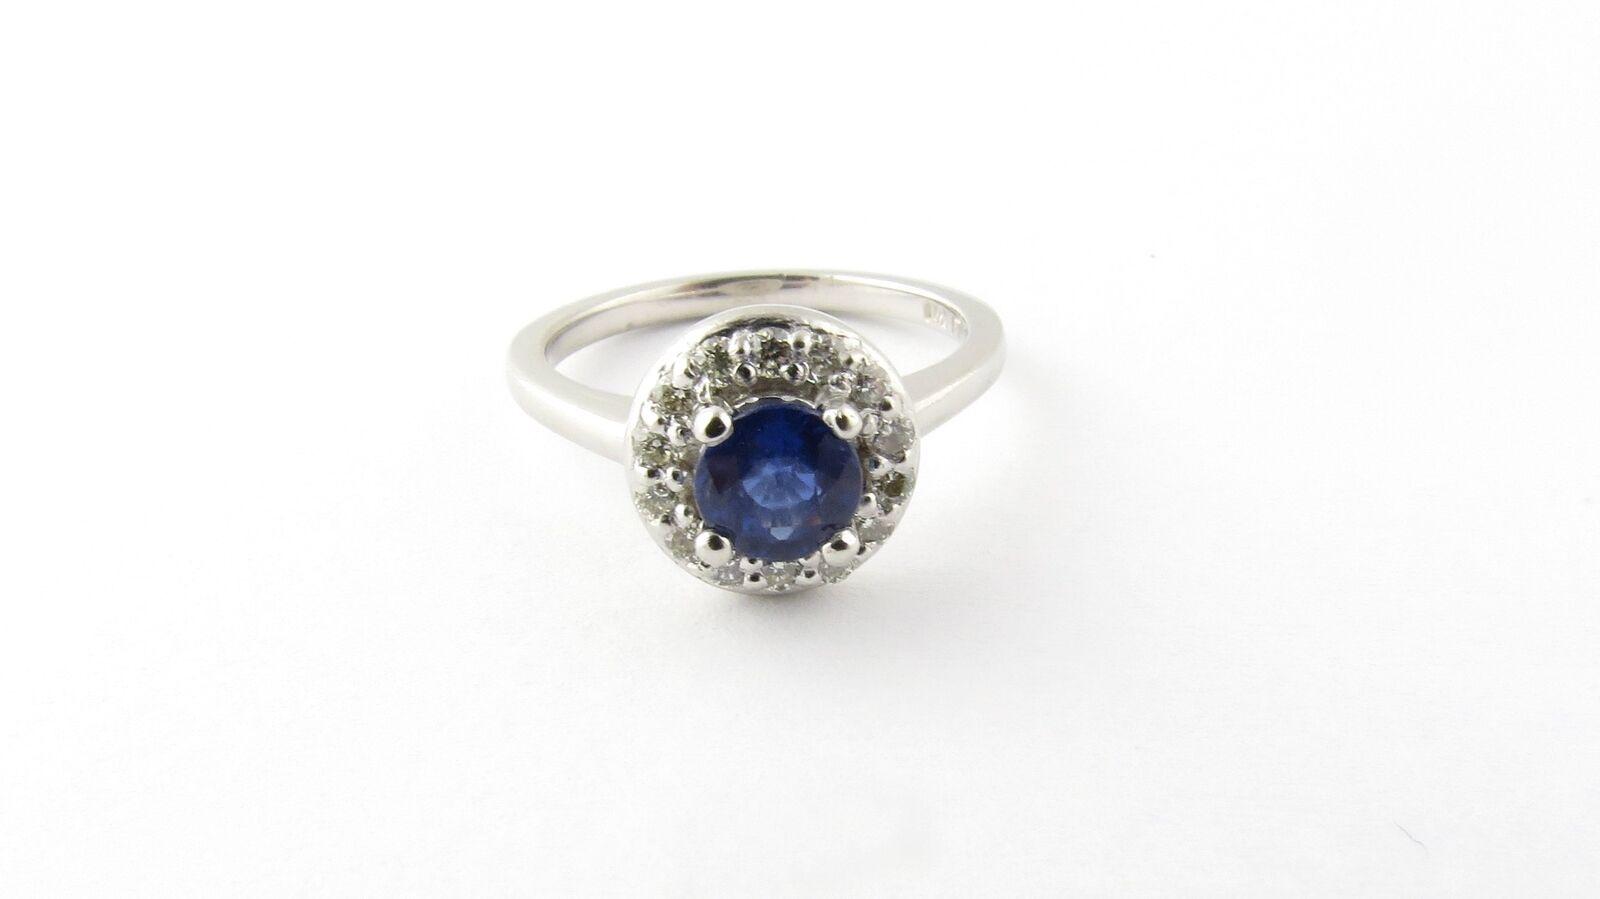 Vintage Platinum Sapphire and Diamond Ring 4.5